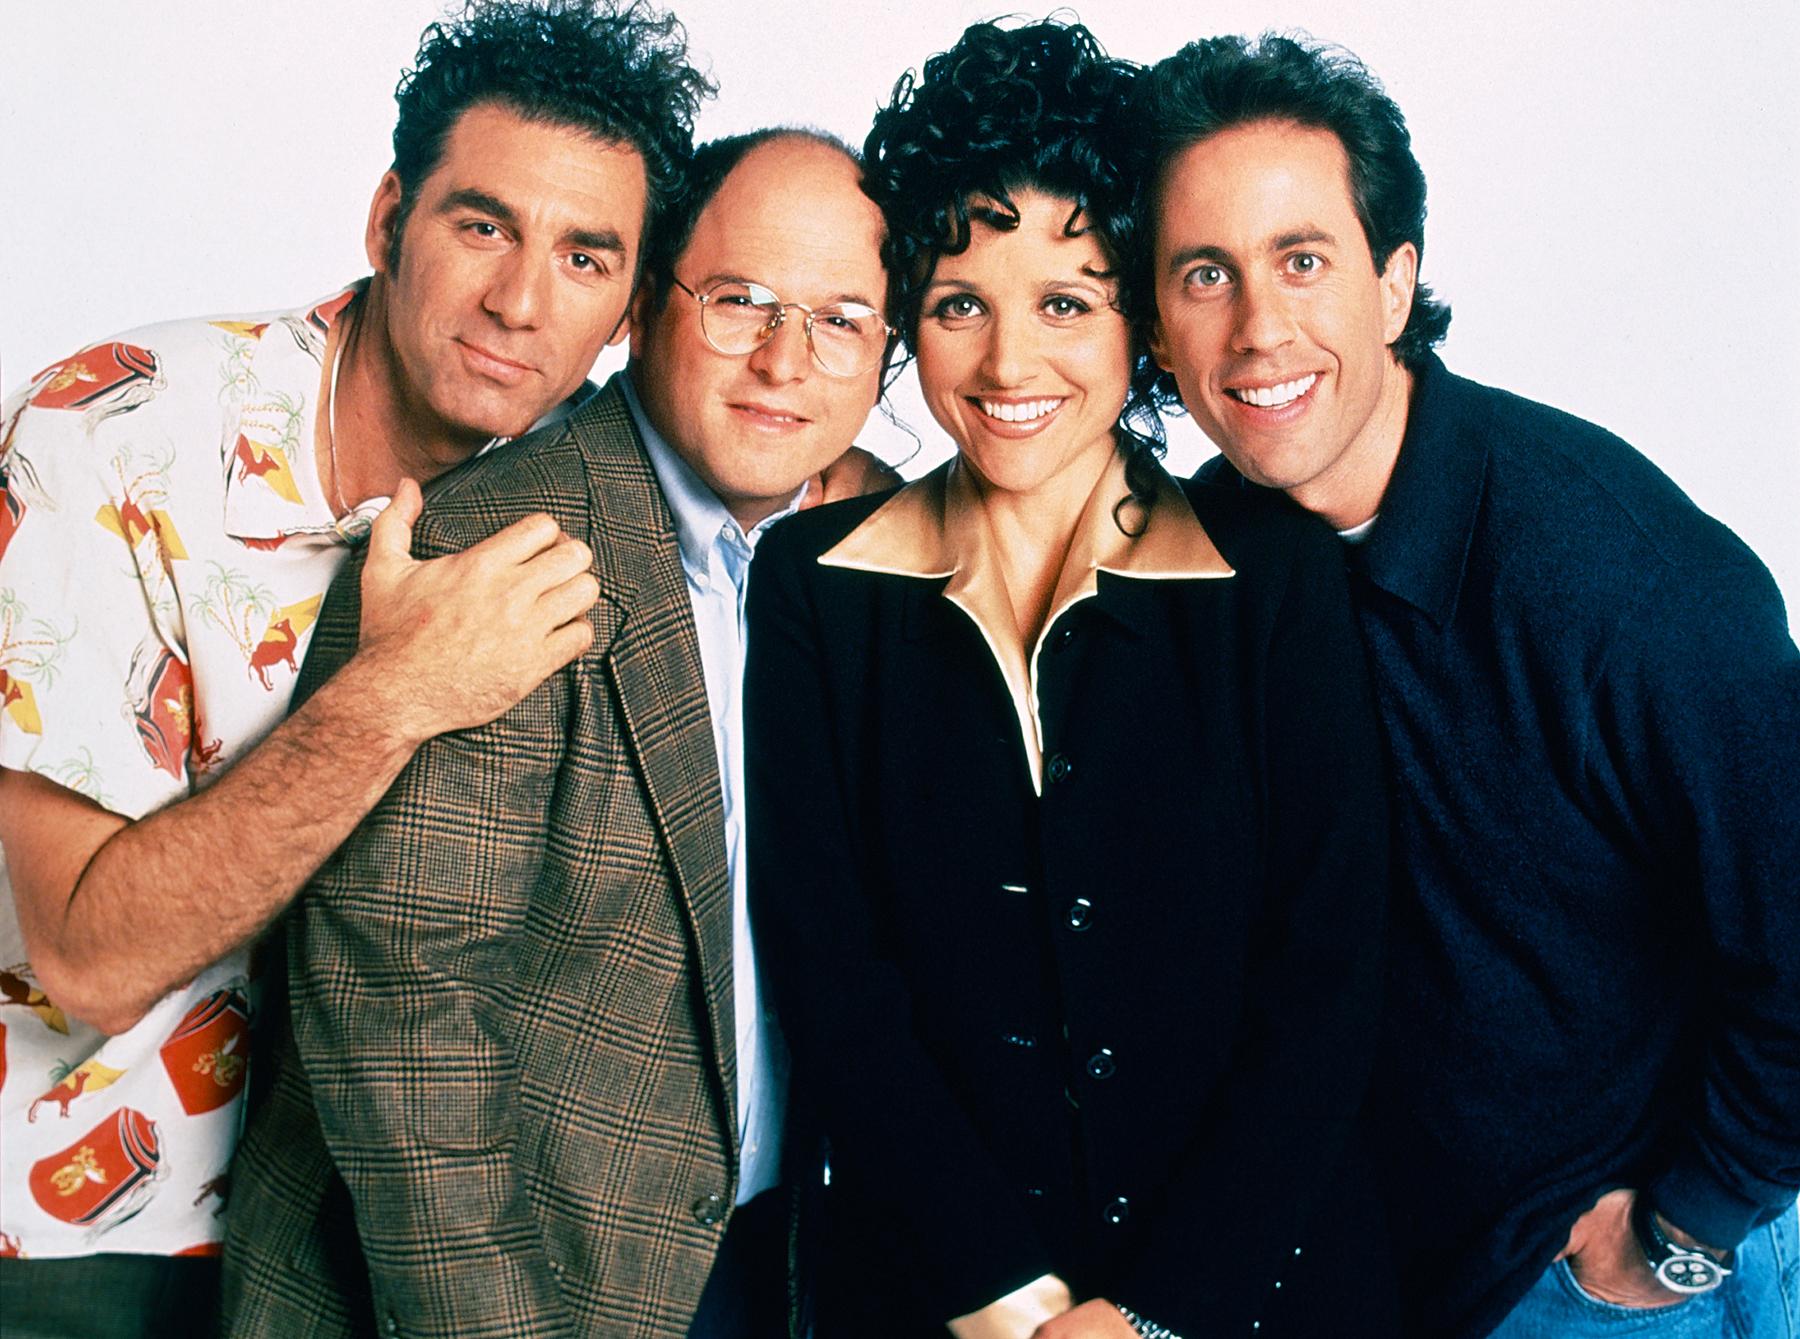 b13e2cad99dd6 'Seinfeld': Bryan Cranston, Teri Hatcher, 'Newman' on Memorable Roles –  Rolling Stone